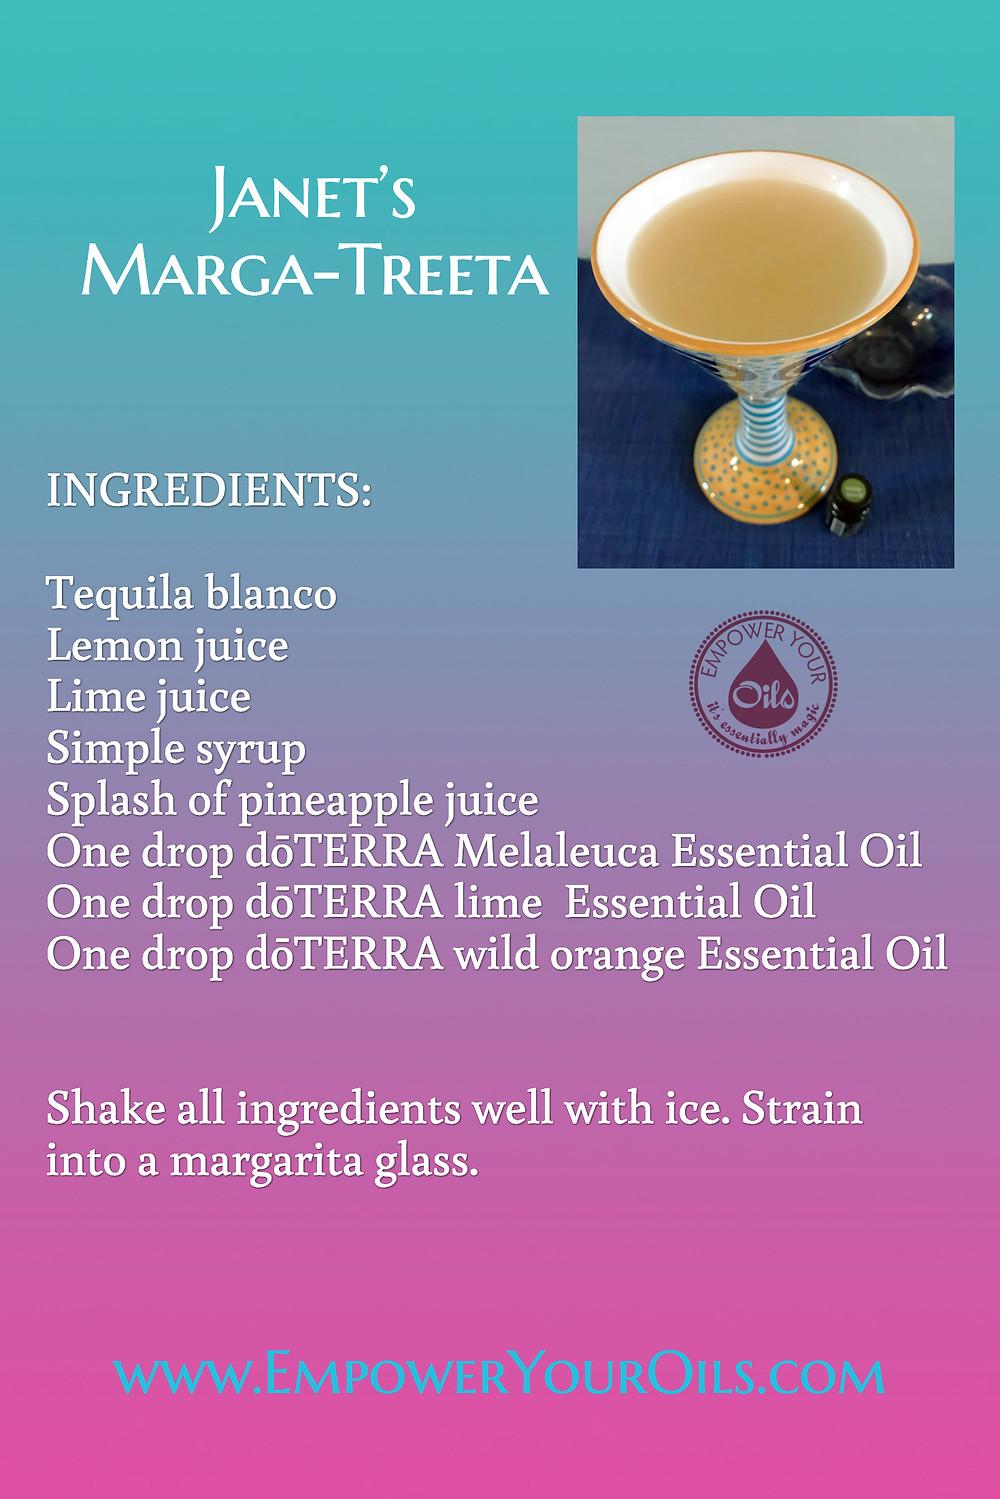 Janet's Marga-Treeta Recipe